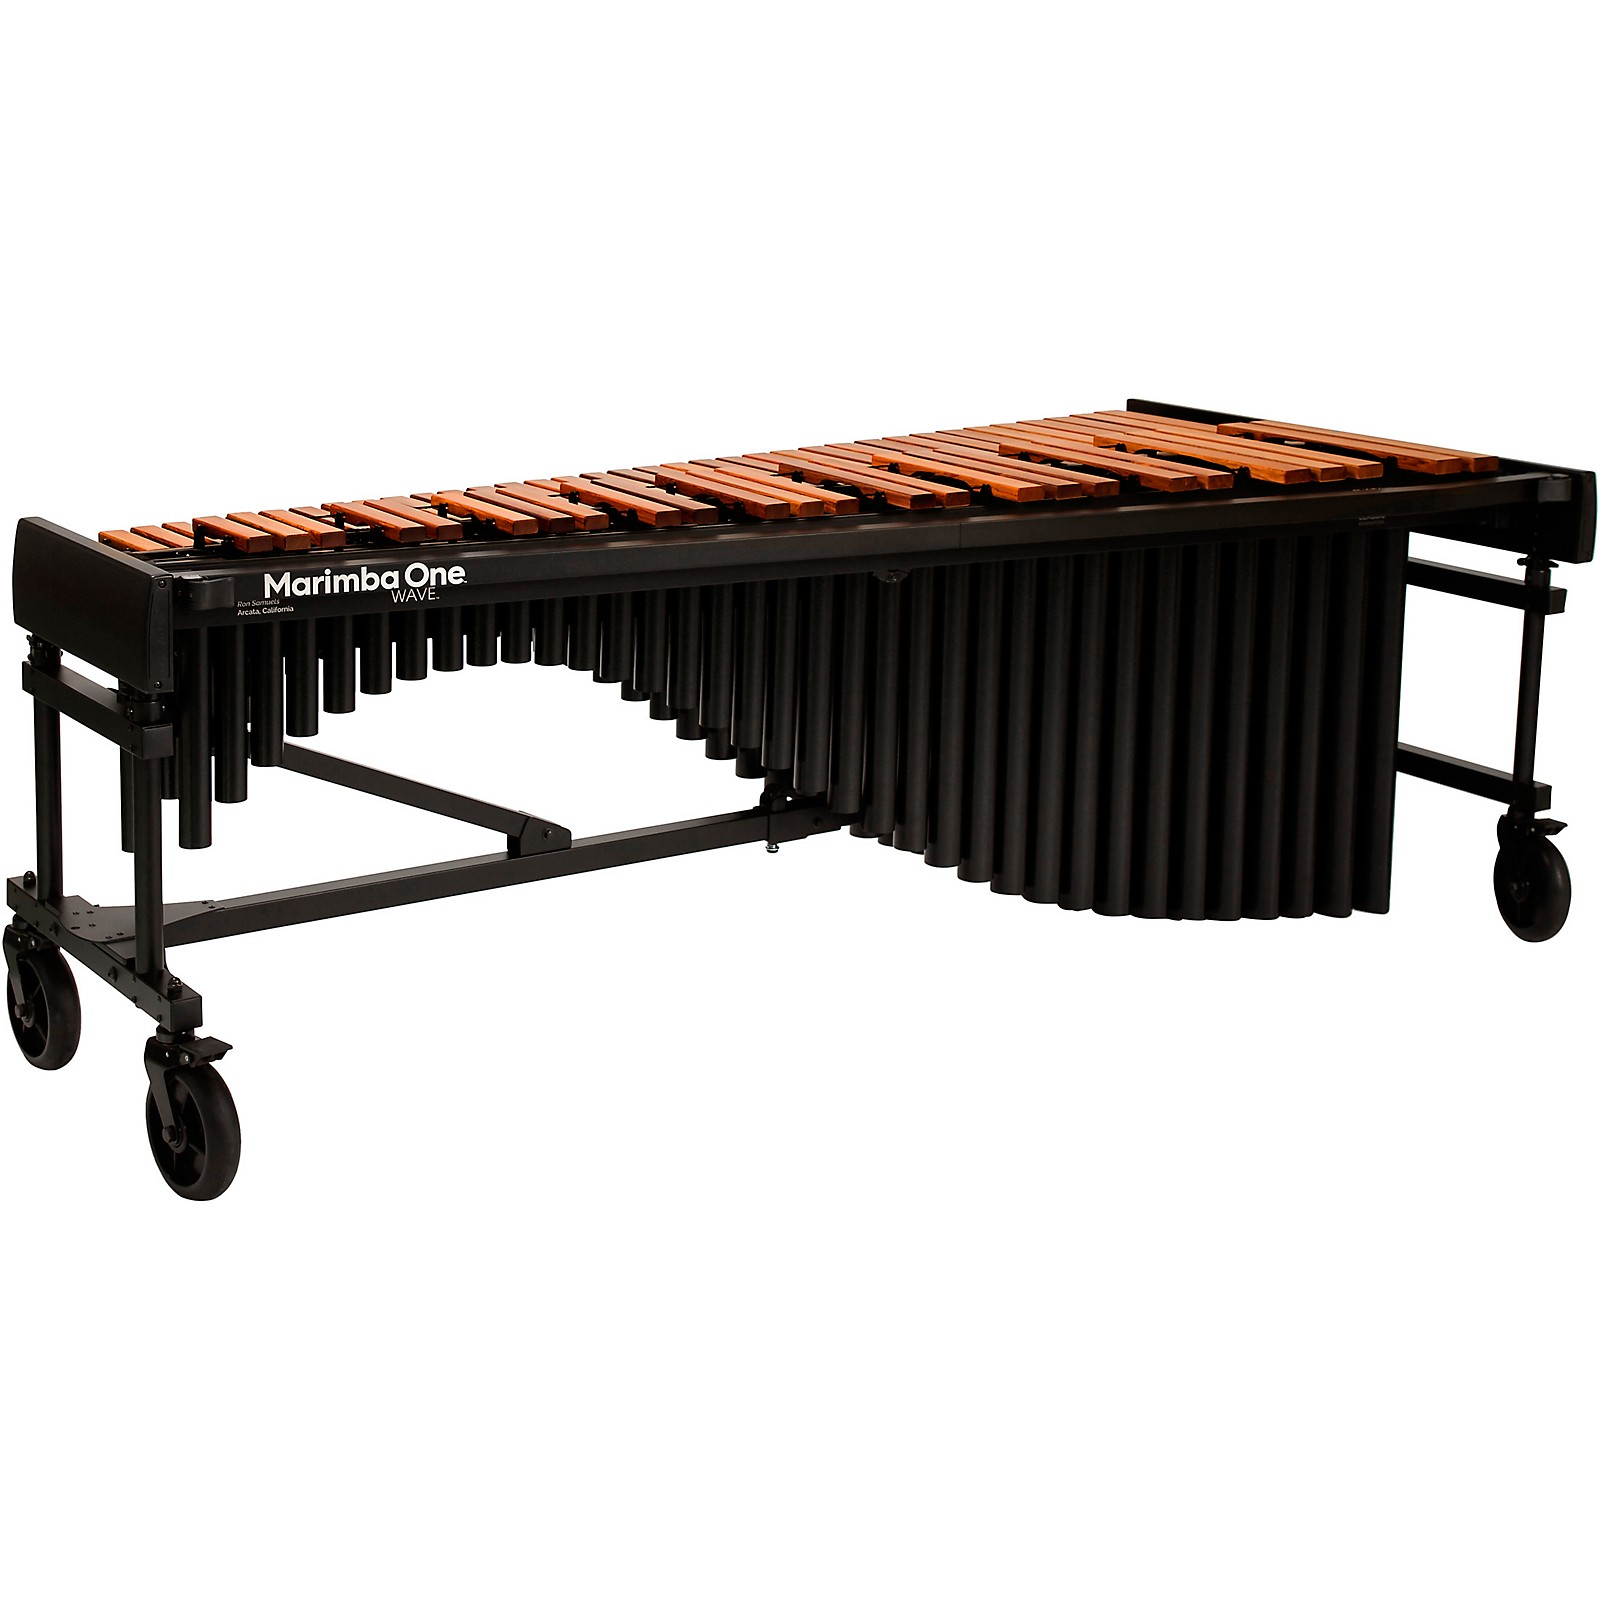 Marimba One Wave #9611 A442 5.0 Octave Marimba with Traditional Keyboard and Classic Resonators 8